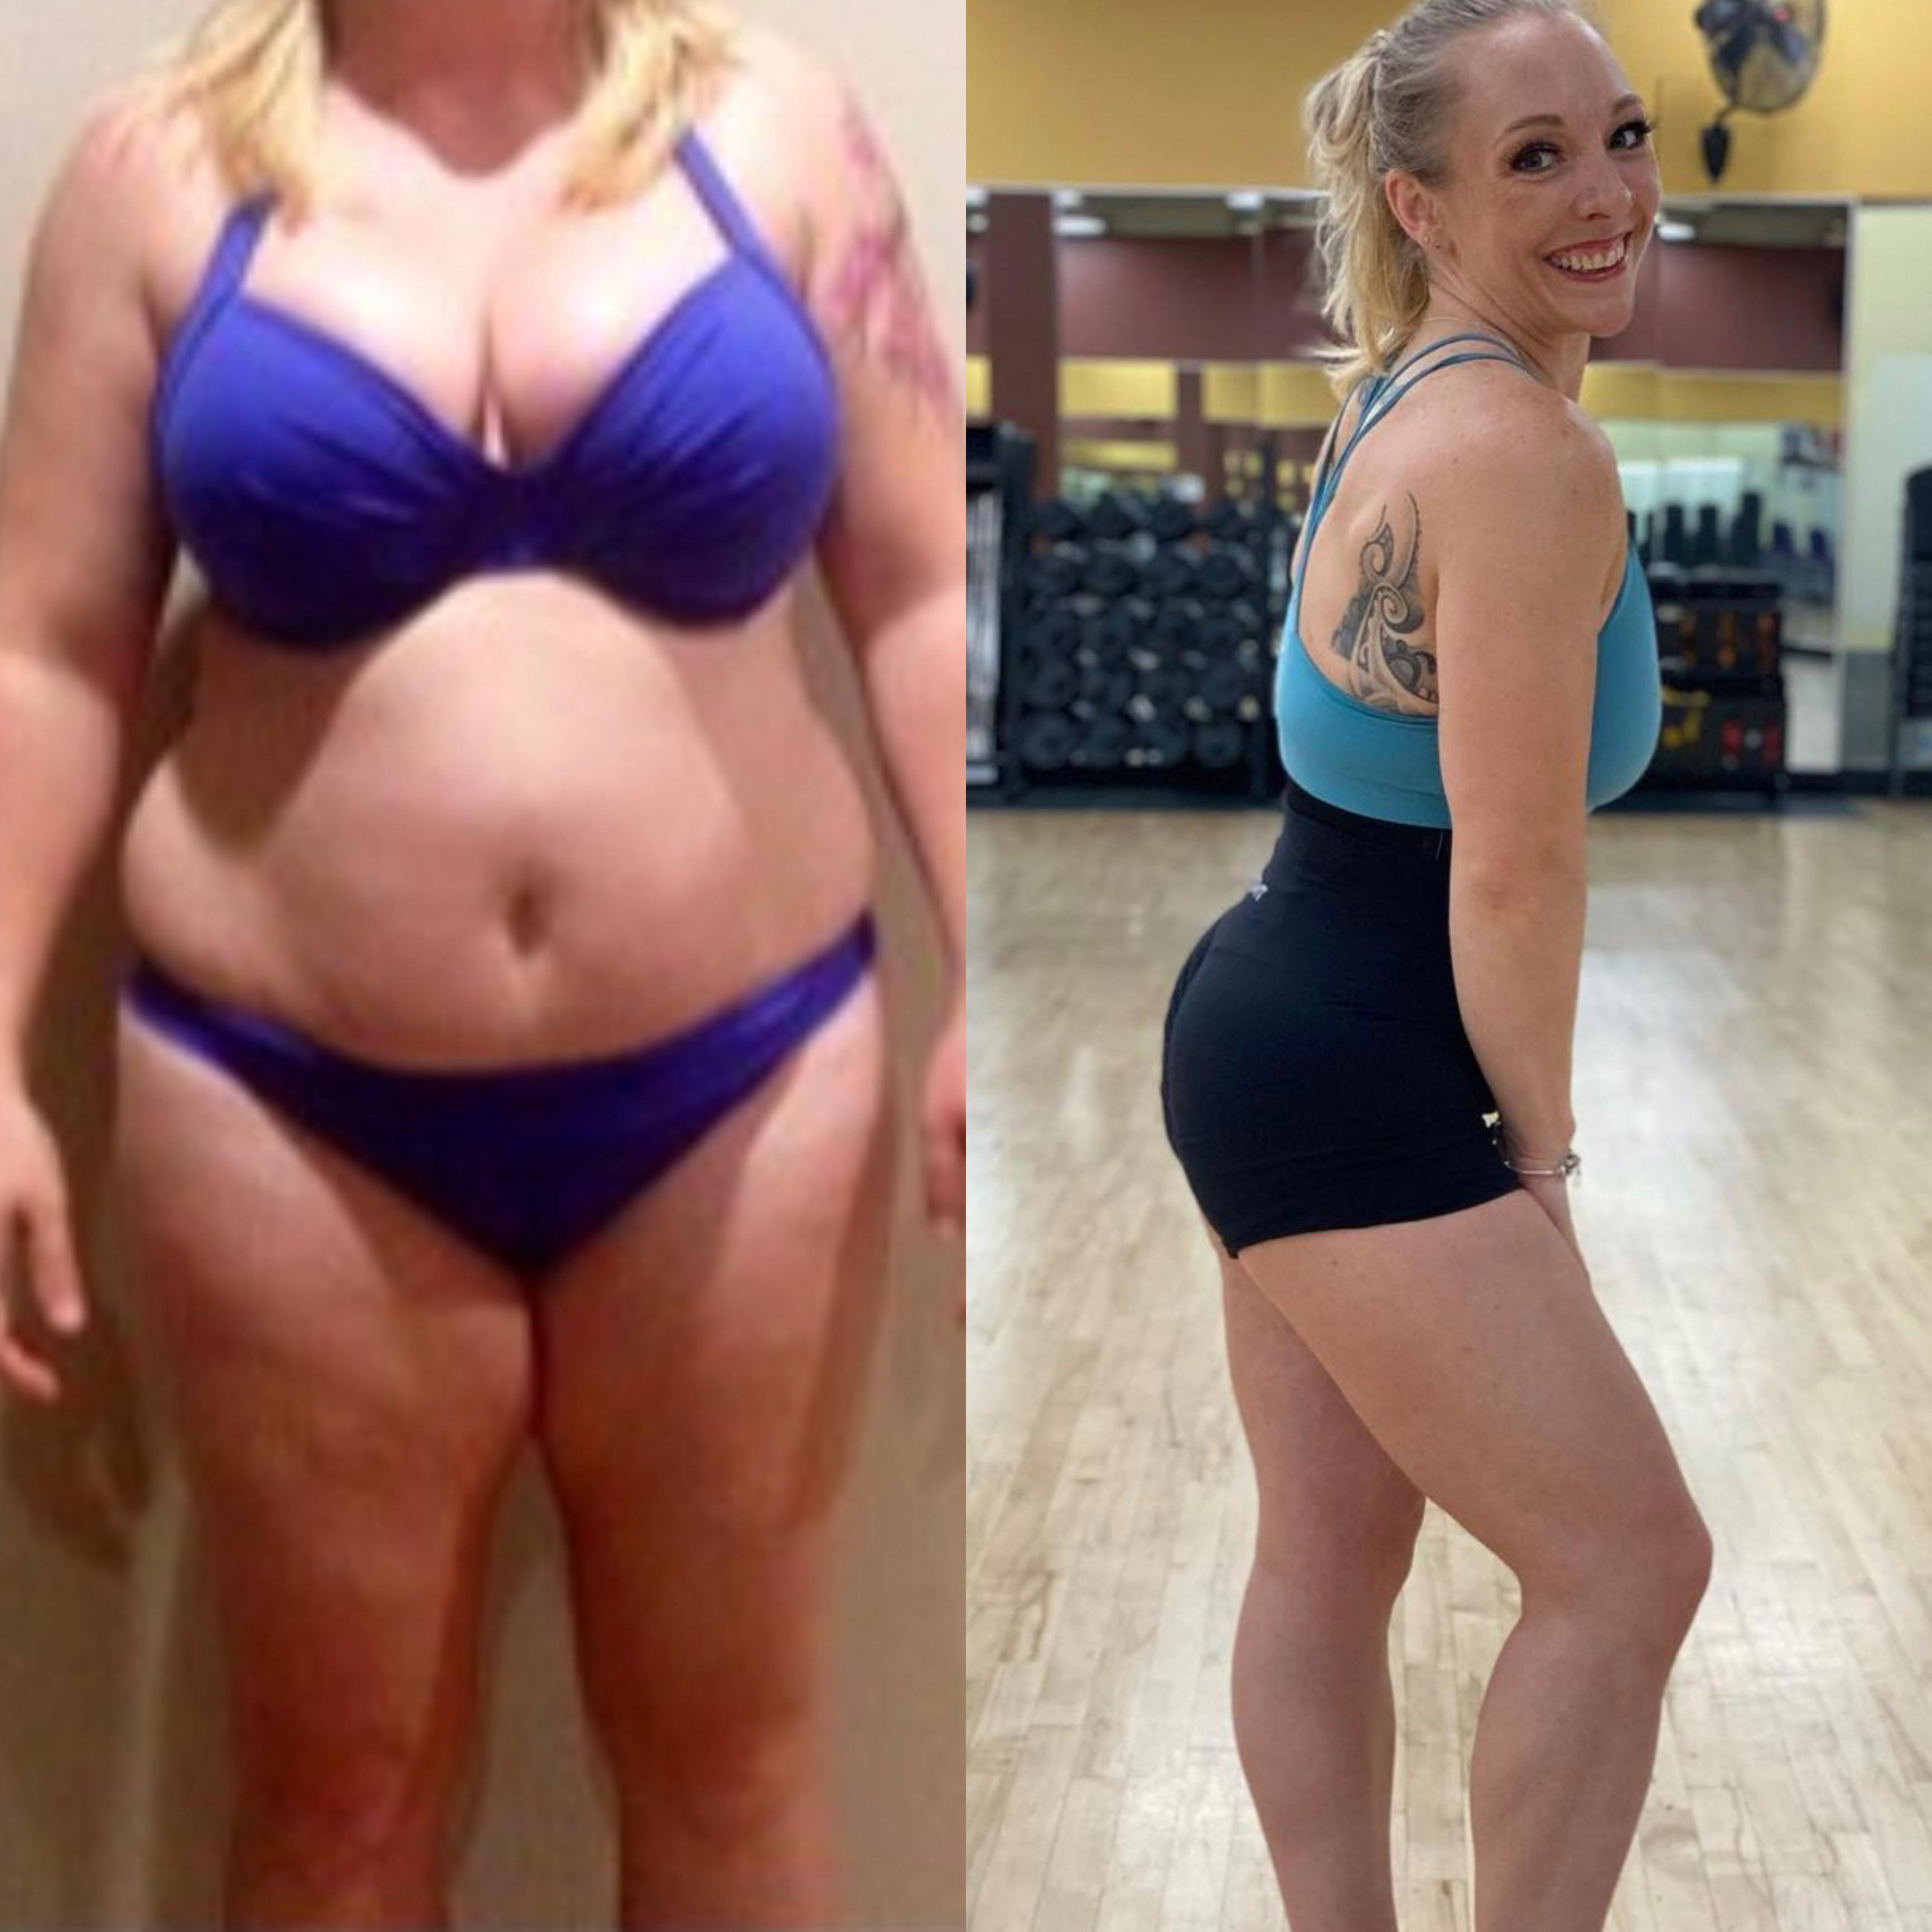 230 lbs Fat Loss 5 feet 6 Female 350 lbs to 120 lbs